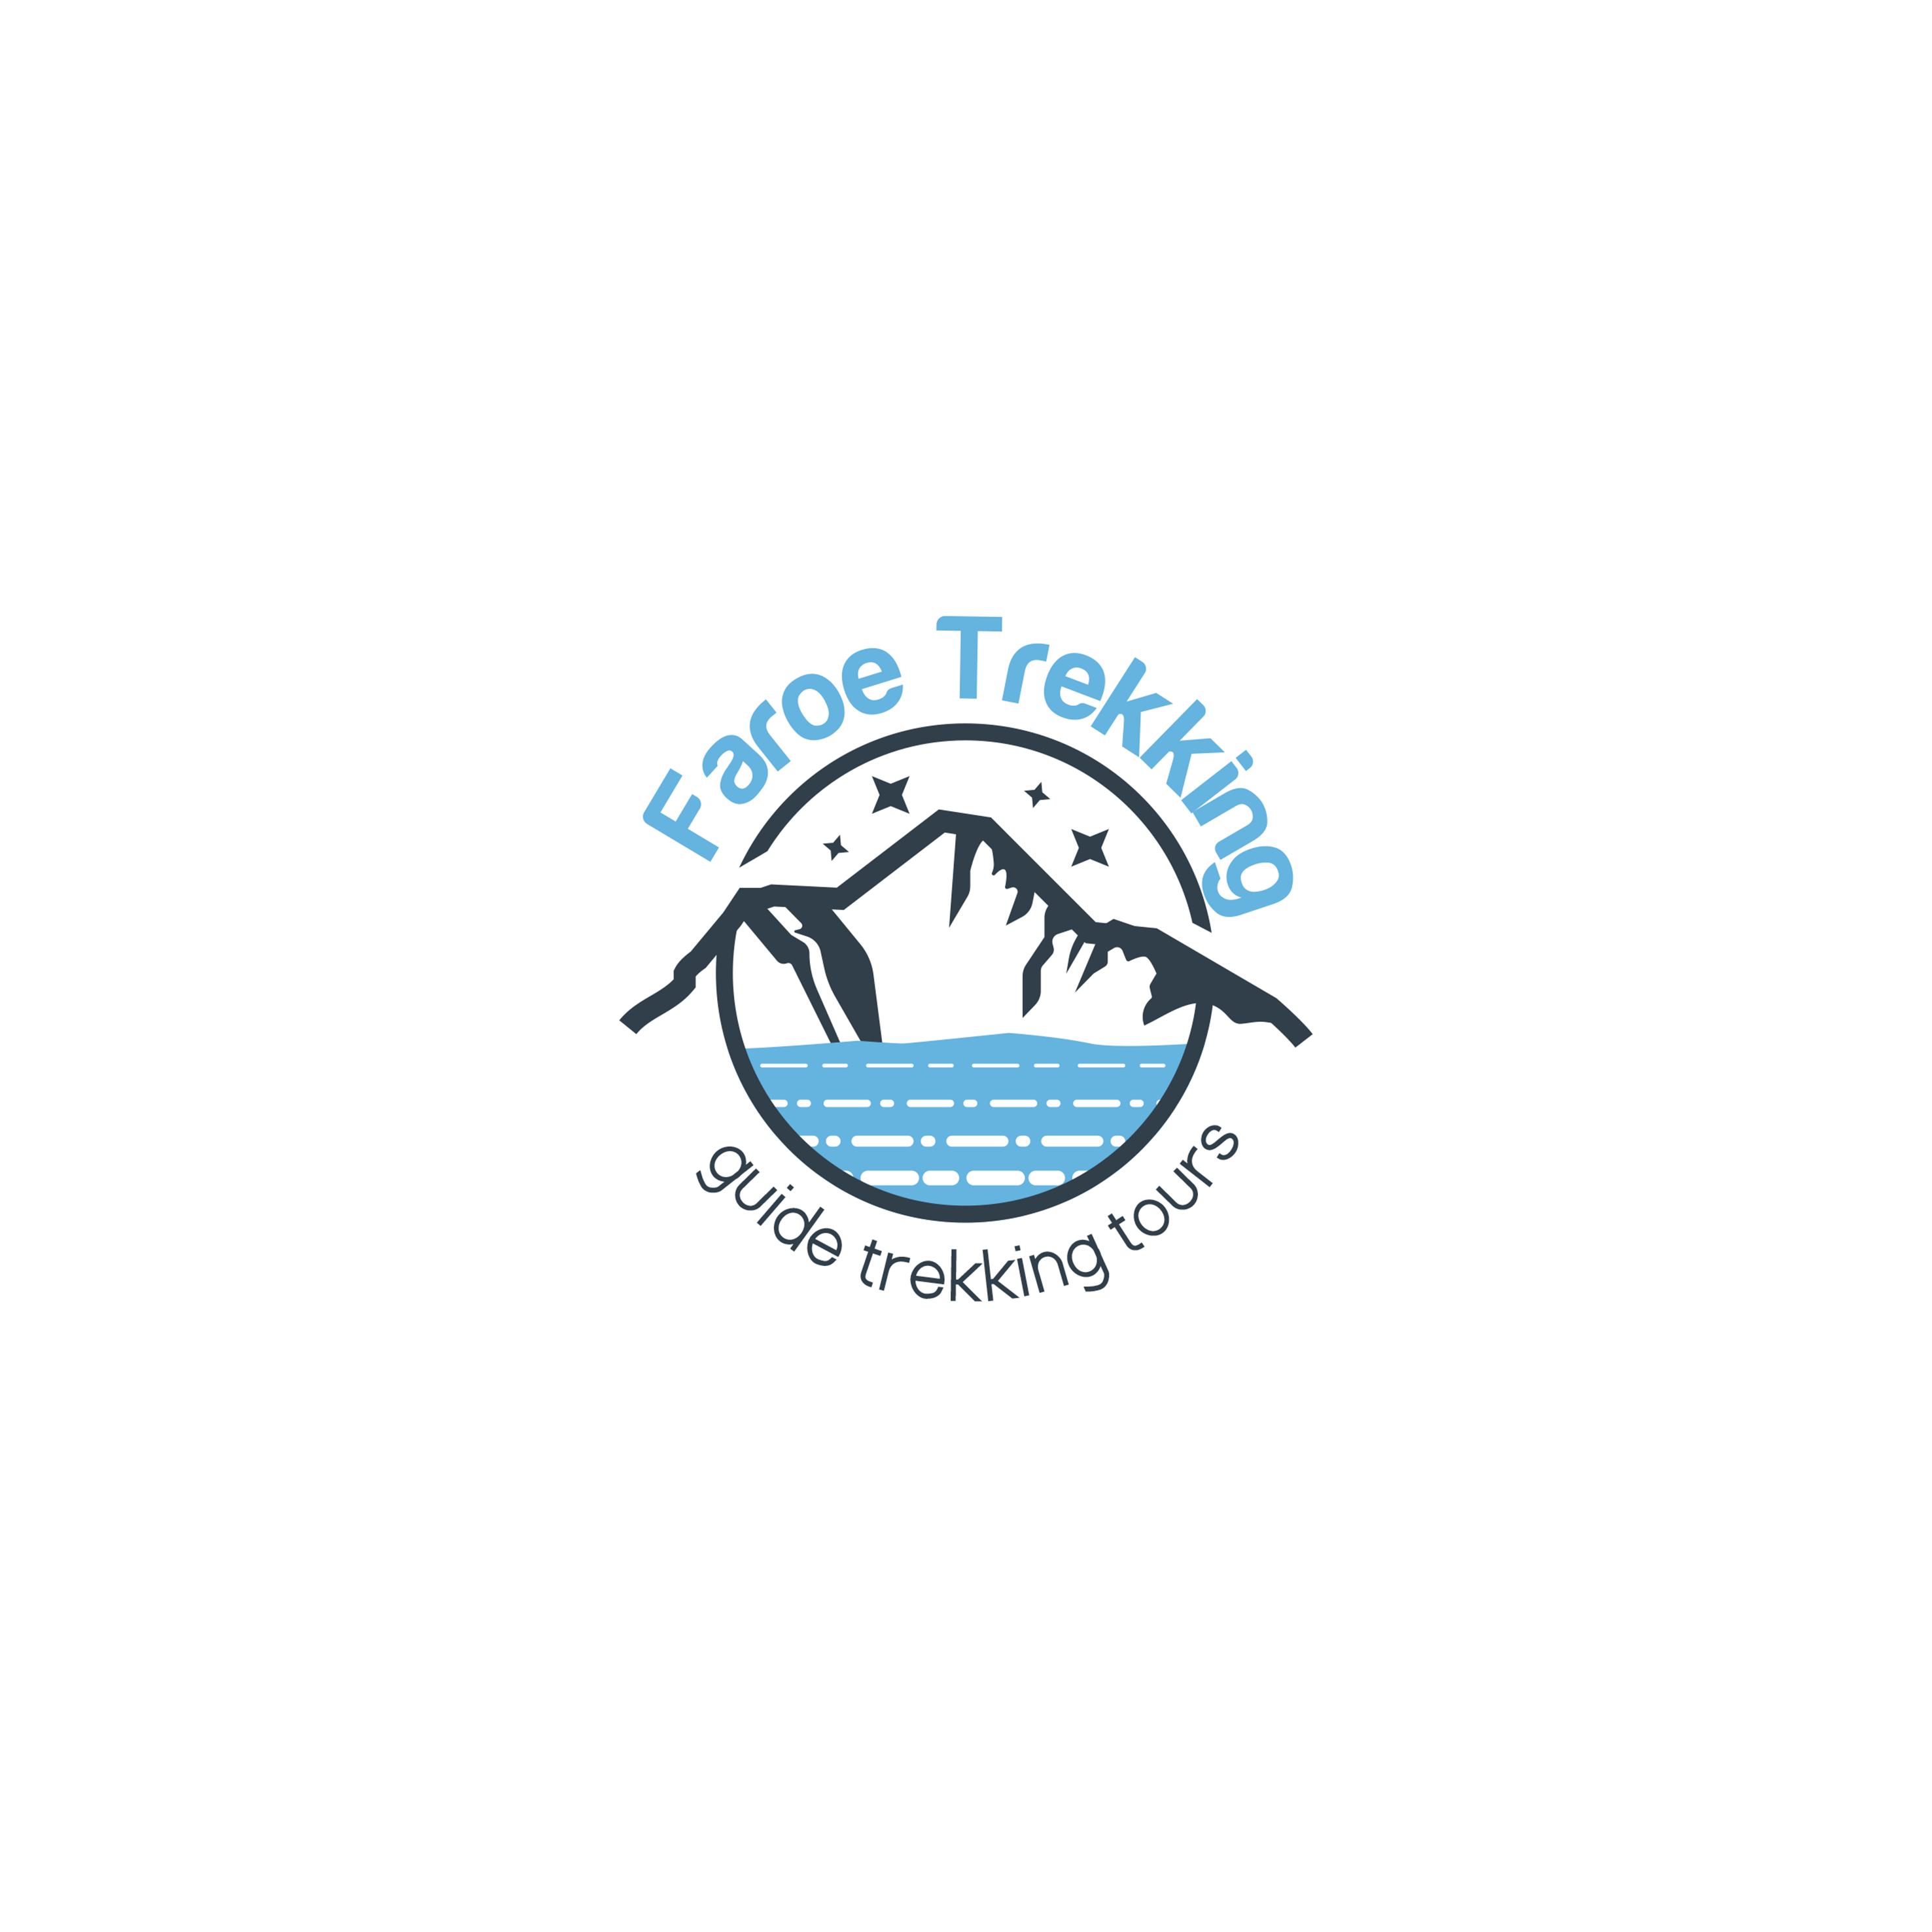 Faroe Trekking Logo Design